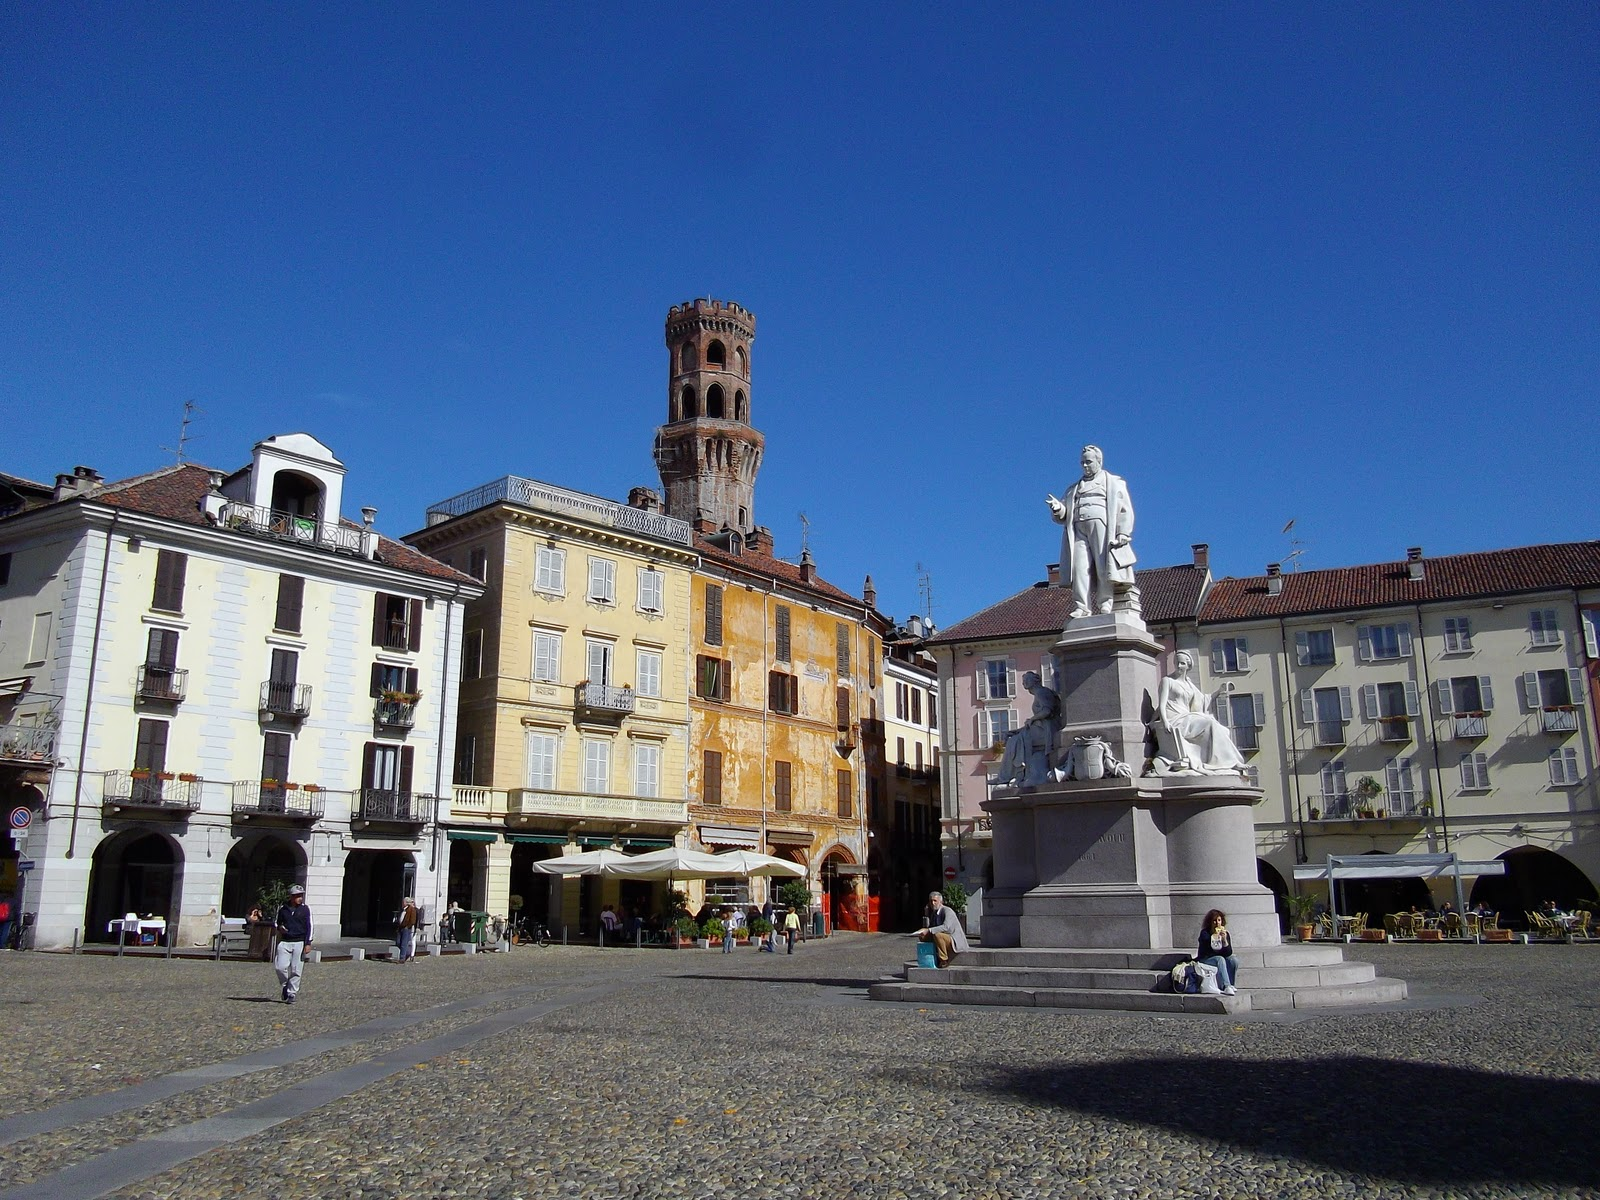 Vigevano Italy  city photos gallery : Trip to Vigevano, Italy | Life in Luxembourg